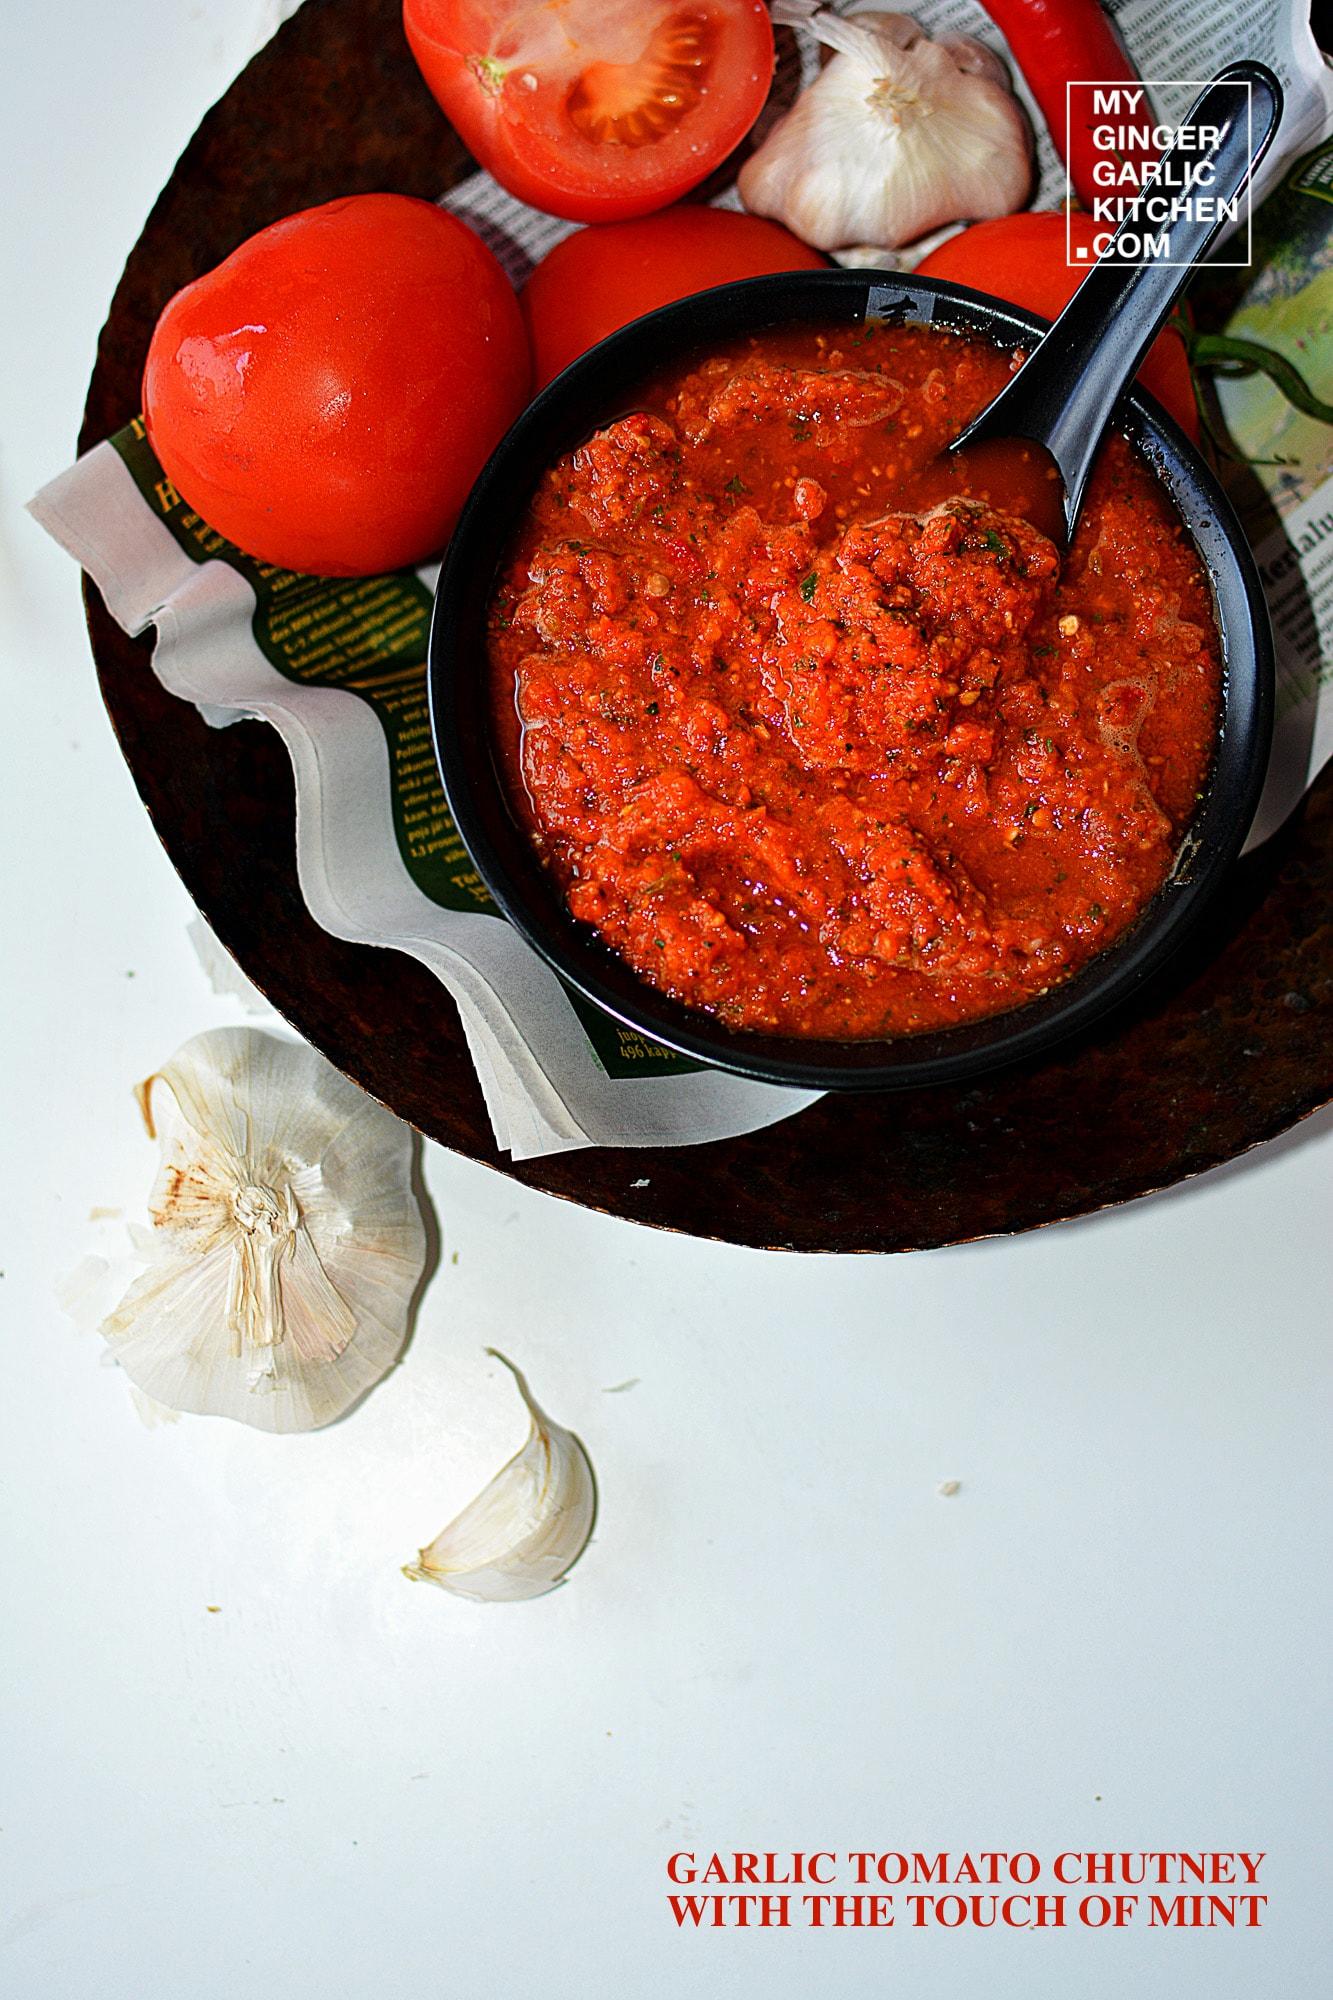 Image - recipe garlic tomato chutney with the touch of int anupama paliwal my ginger garlic kitchen 4